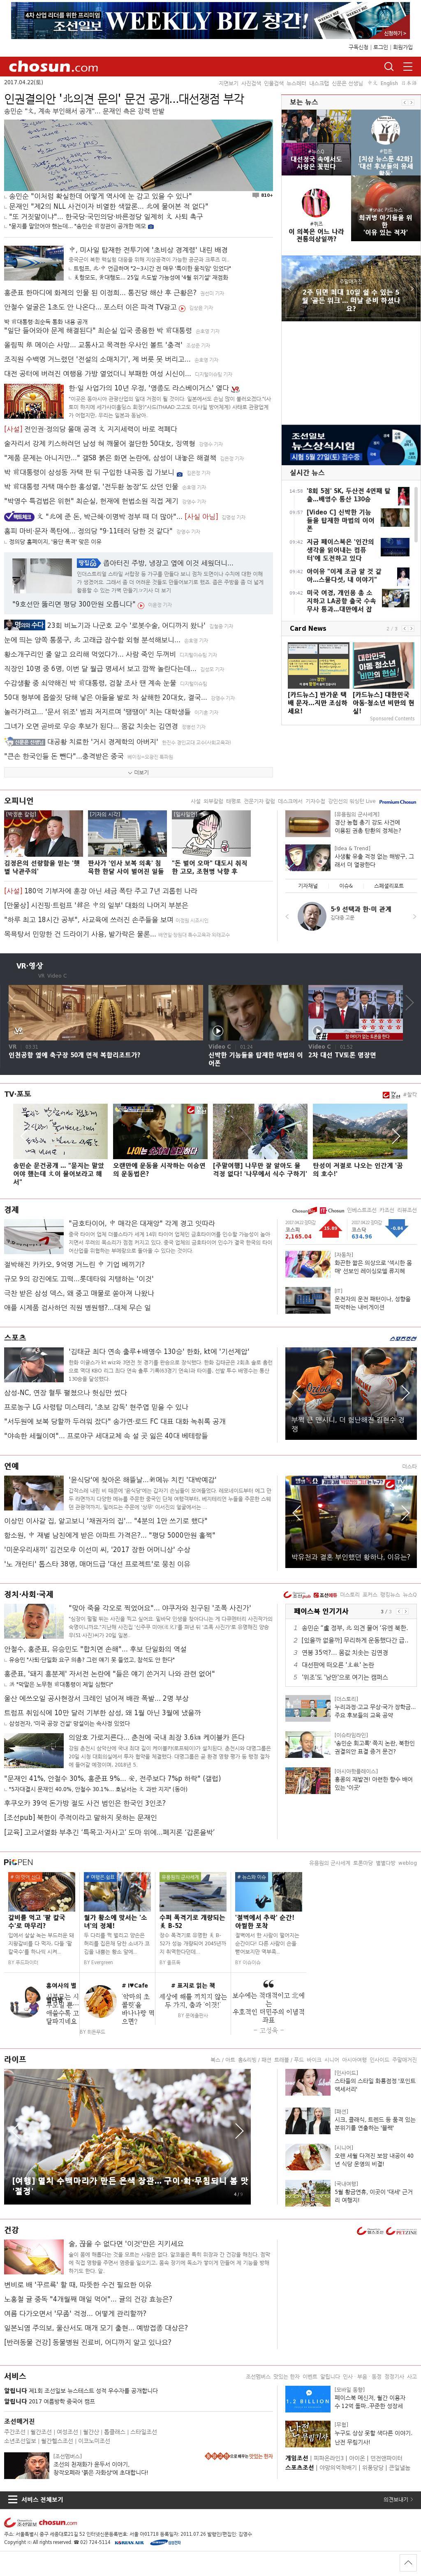 chosun.com at Friday April 21, 2017, 4:05 p.m. UTC